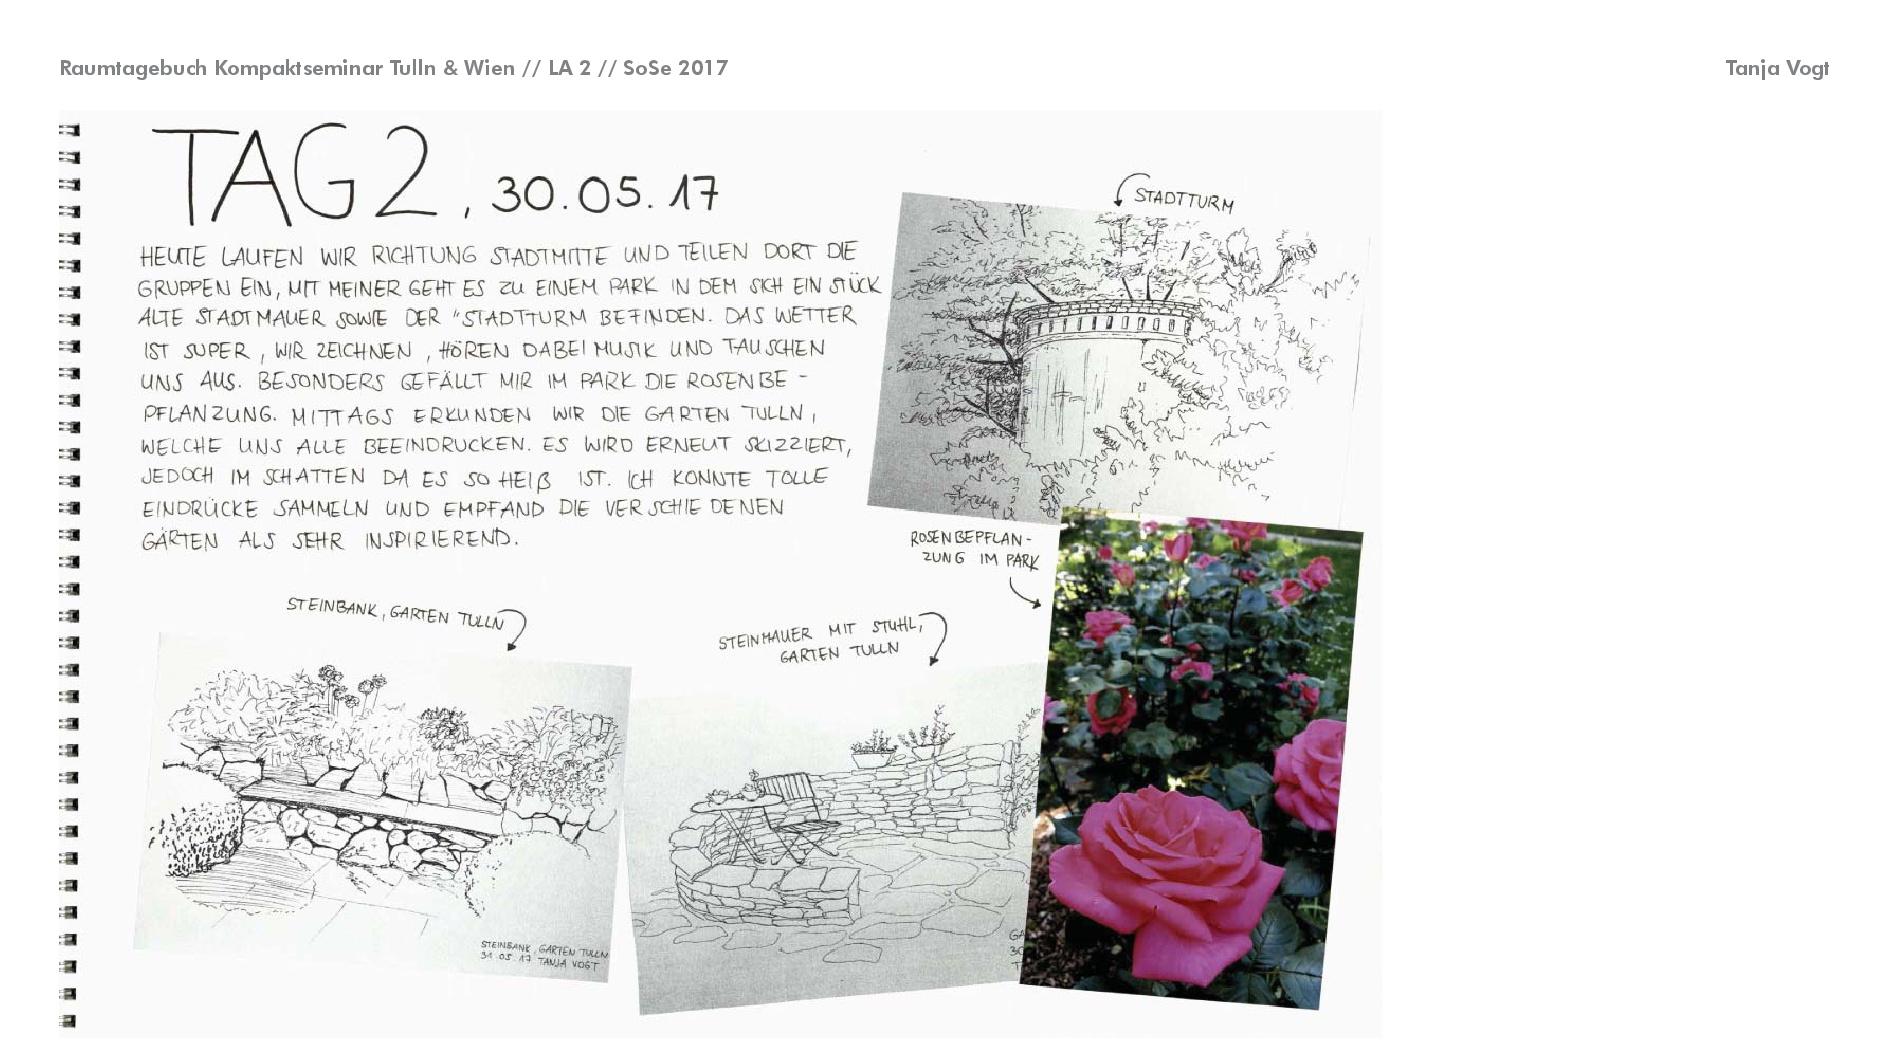 NEU Screen Raumtagebuch Tulln Wien SoSe 17 033